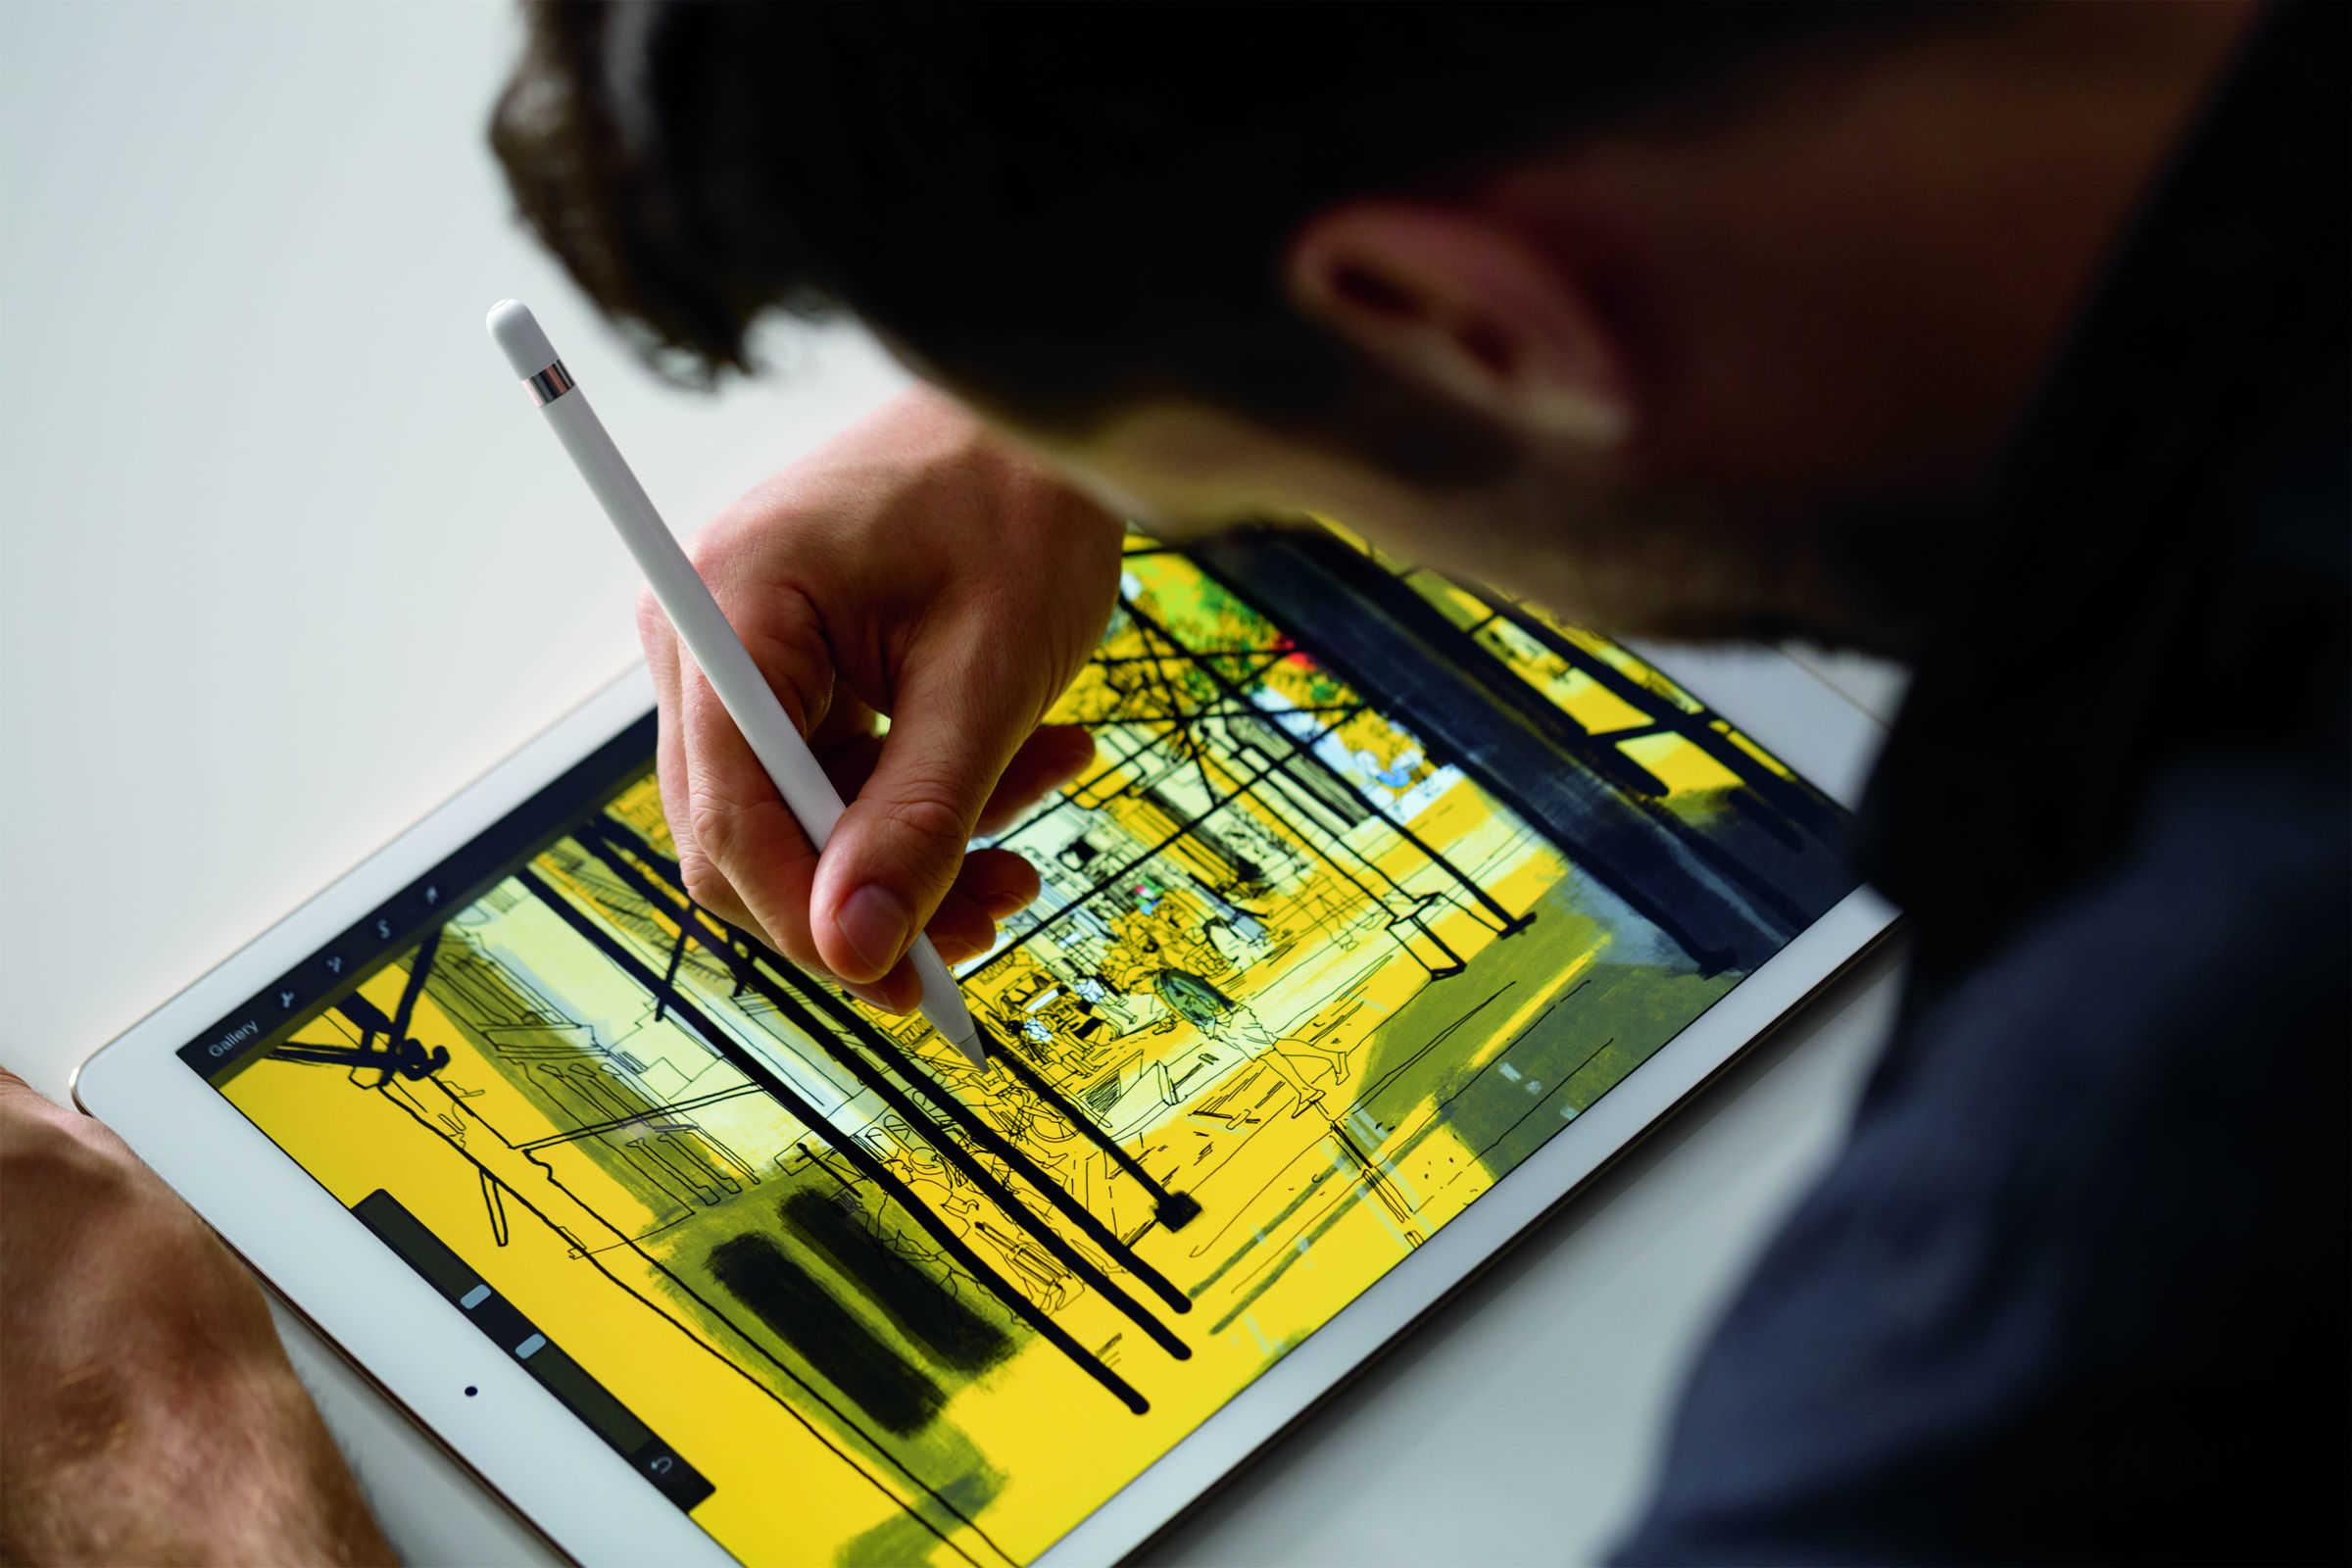 http://cdn.cultofmac.com/wp-content/uploads/2015/09/Apple_Pencil_with_iPad_Pro.jpg